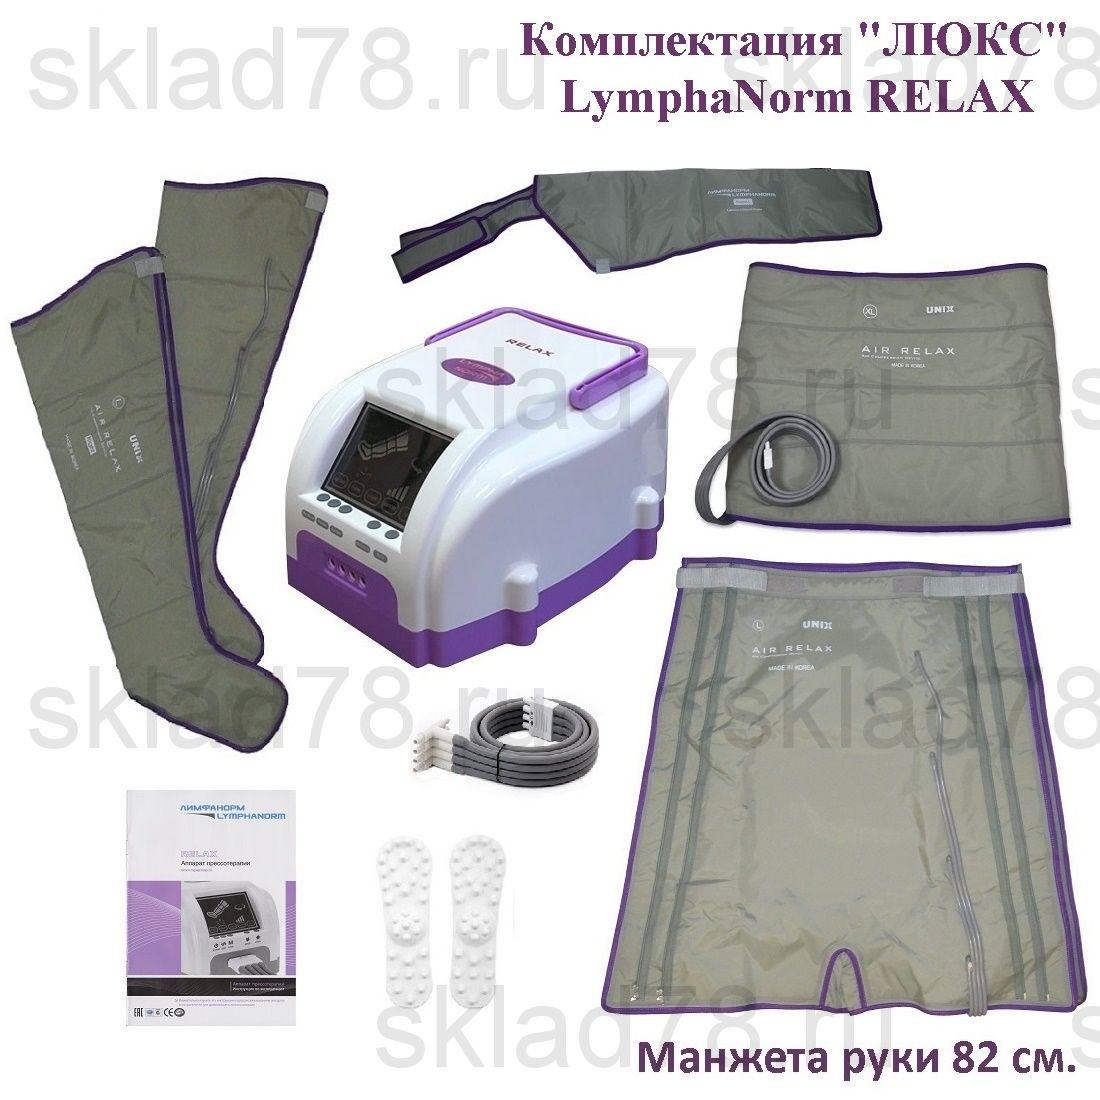 LymphaNorm RELAX Лимфодренаж «ЛЮКС» (рука 82 см.)